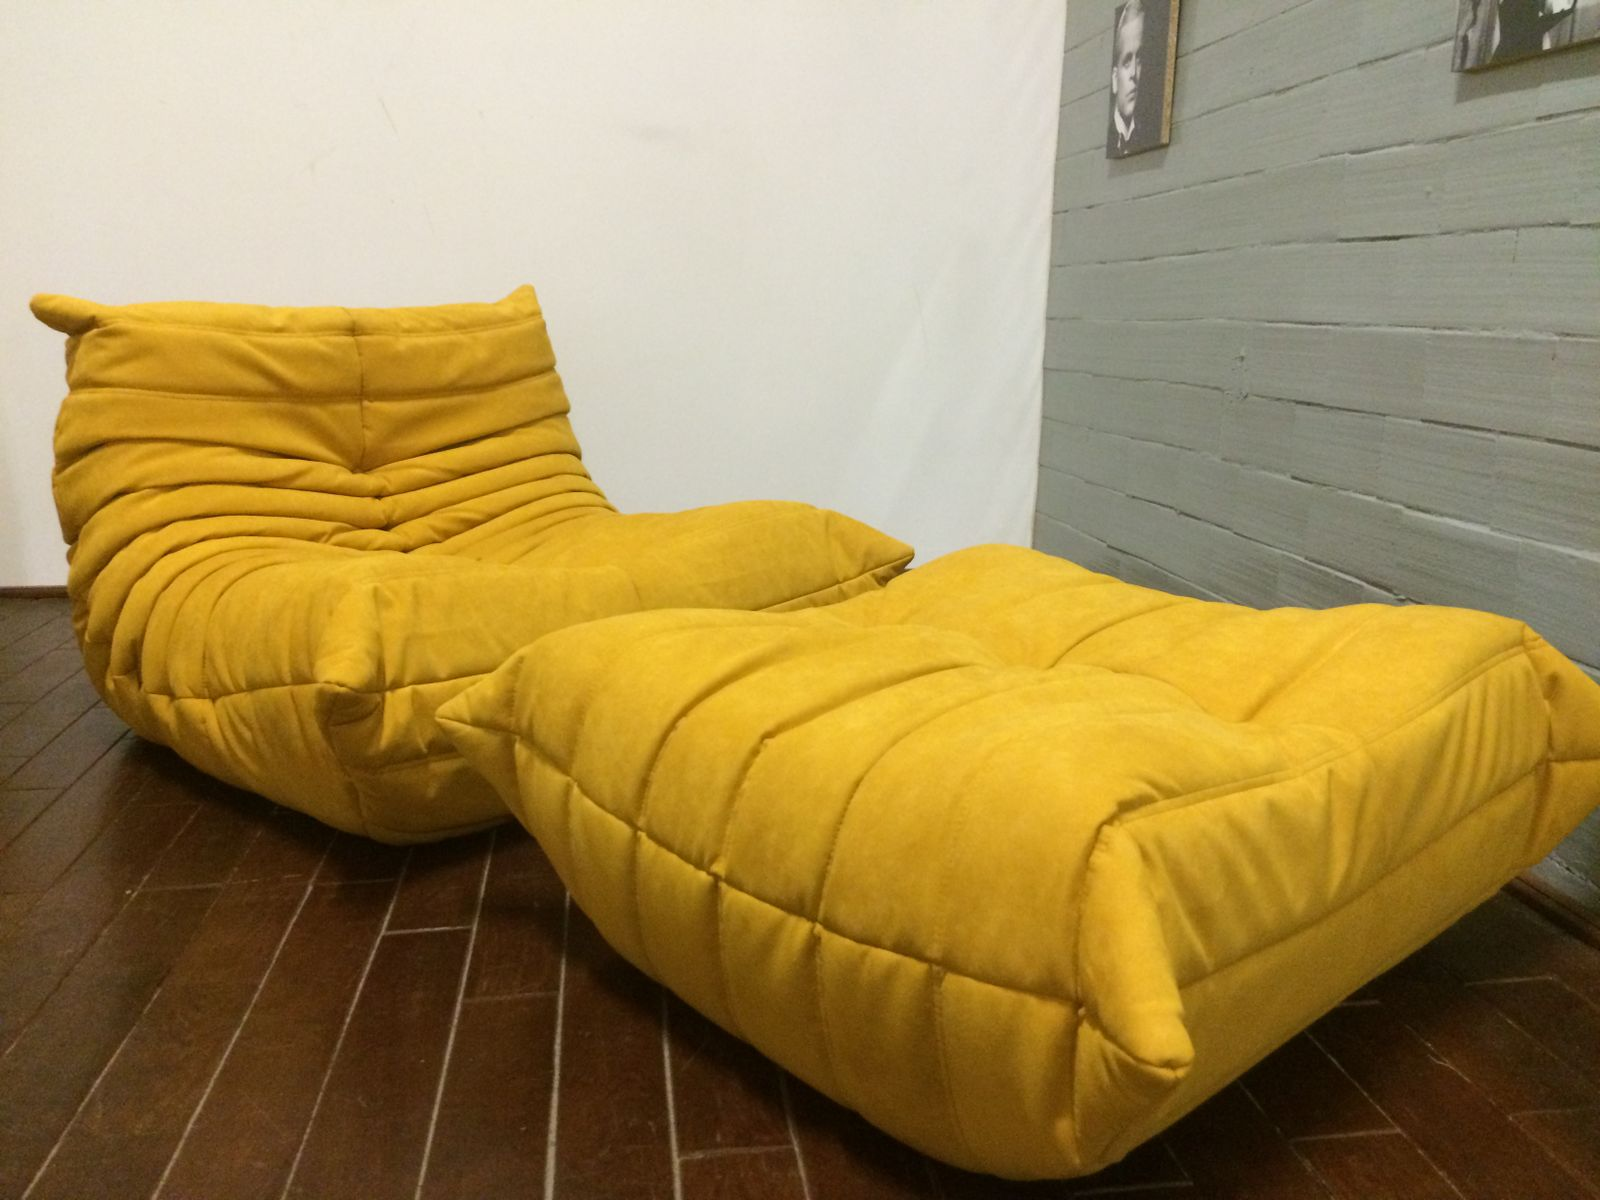 yellow alcantara togo sofa set by michel ducaroy for ligne roset 1970s set of 3 for sale at pamono. Black Bedroom Furniture Sets. Home Design Ideas